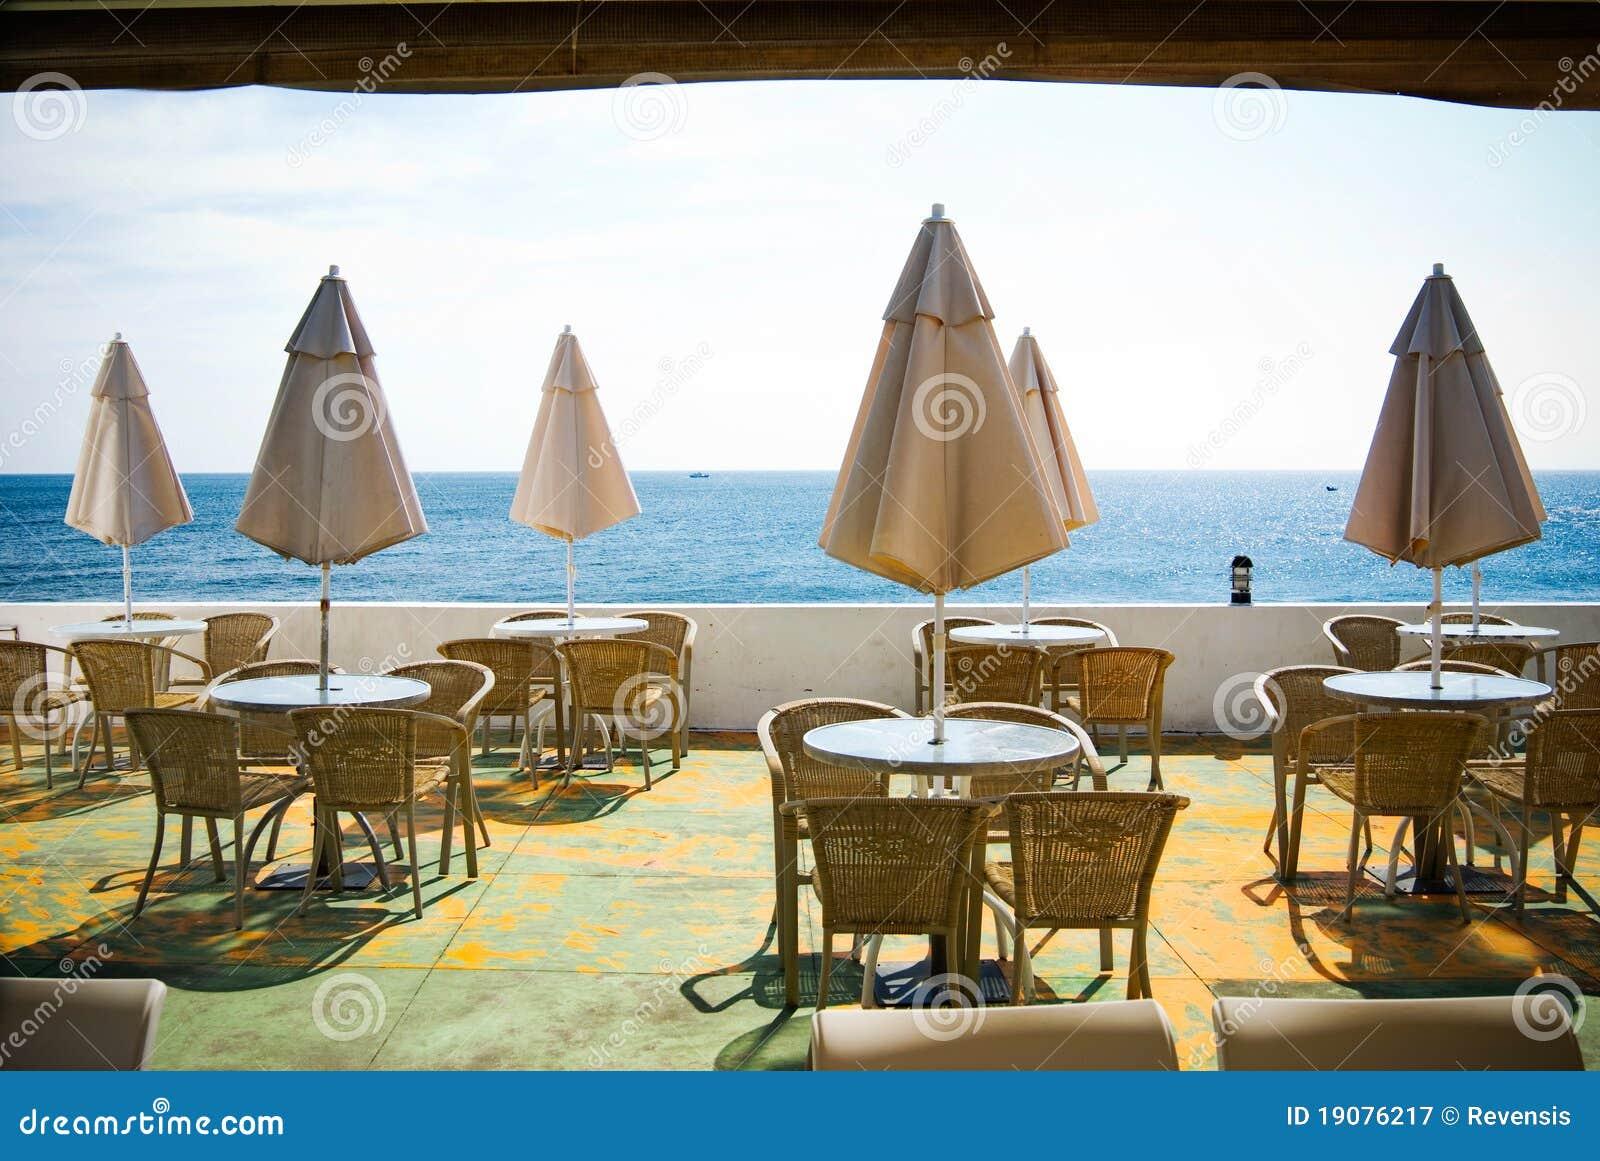 outdoor coffee shop near the sea outdoor coffee shop near the sea ...